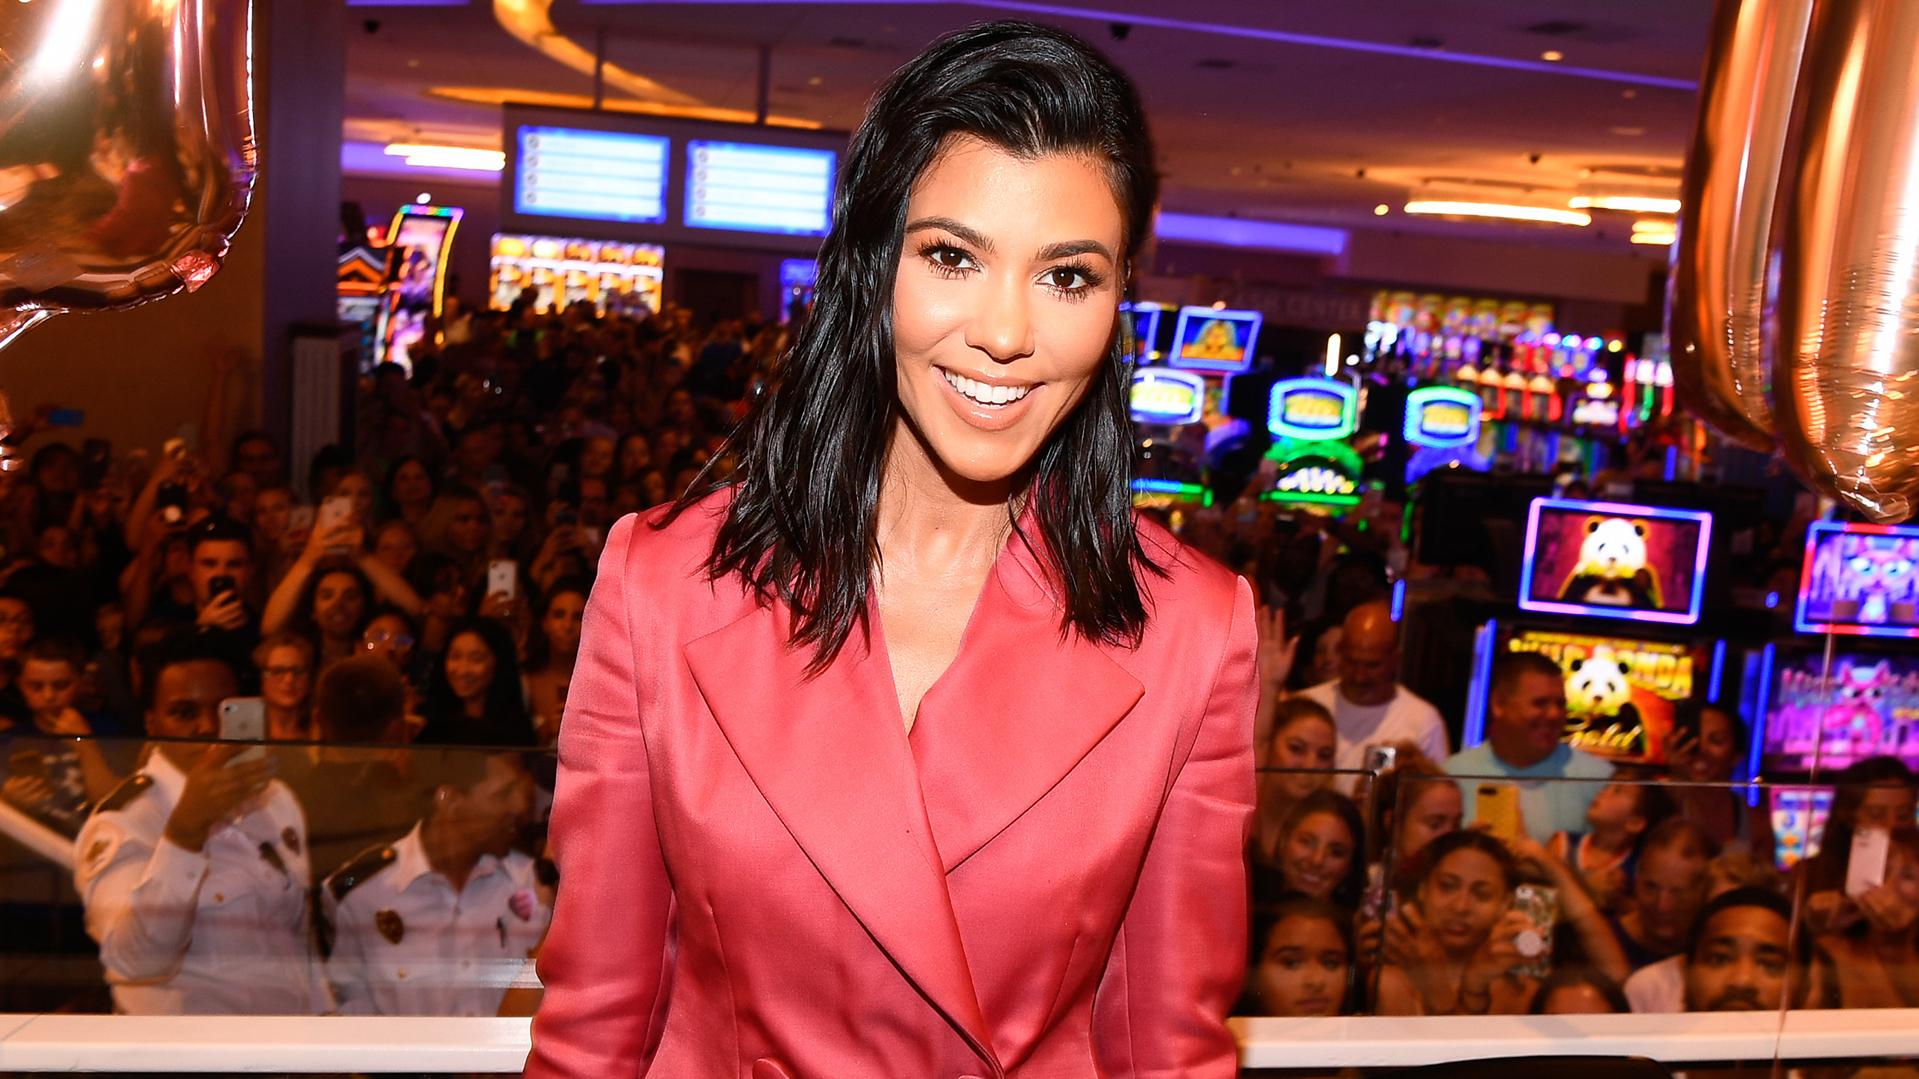 RUMOR: Fans de Kourtney Kardashian sospechan que la figura de TV está embarazada